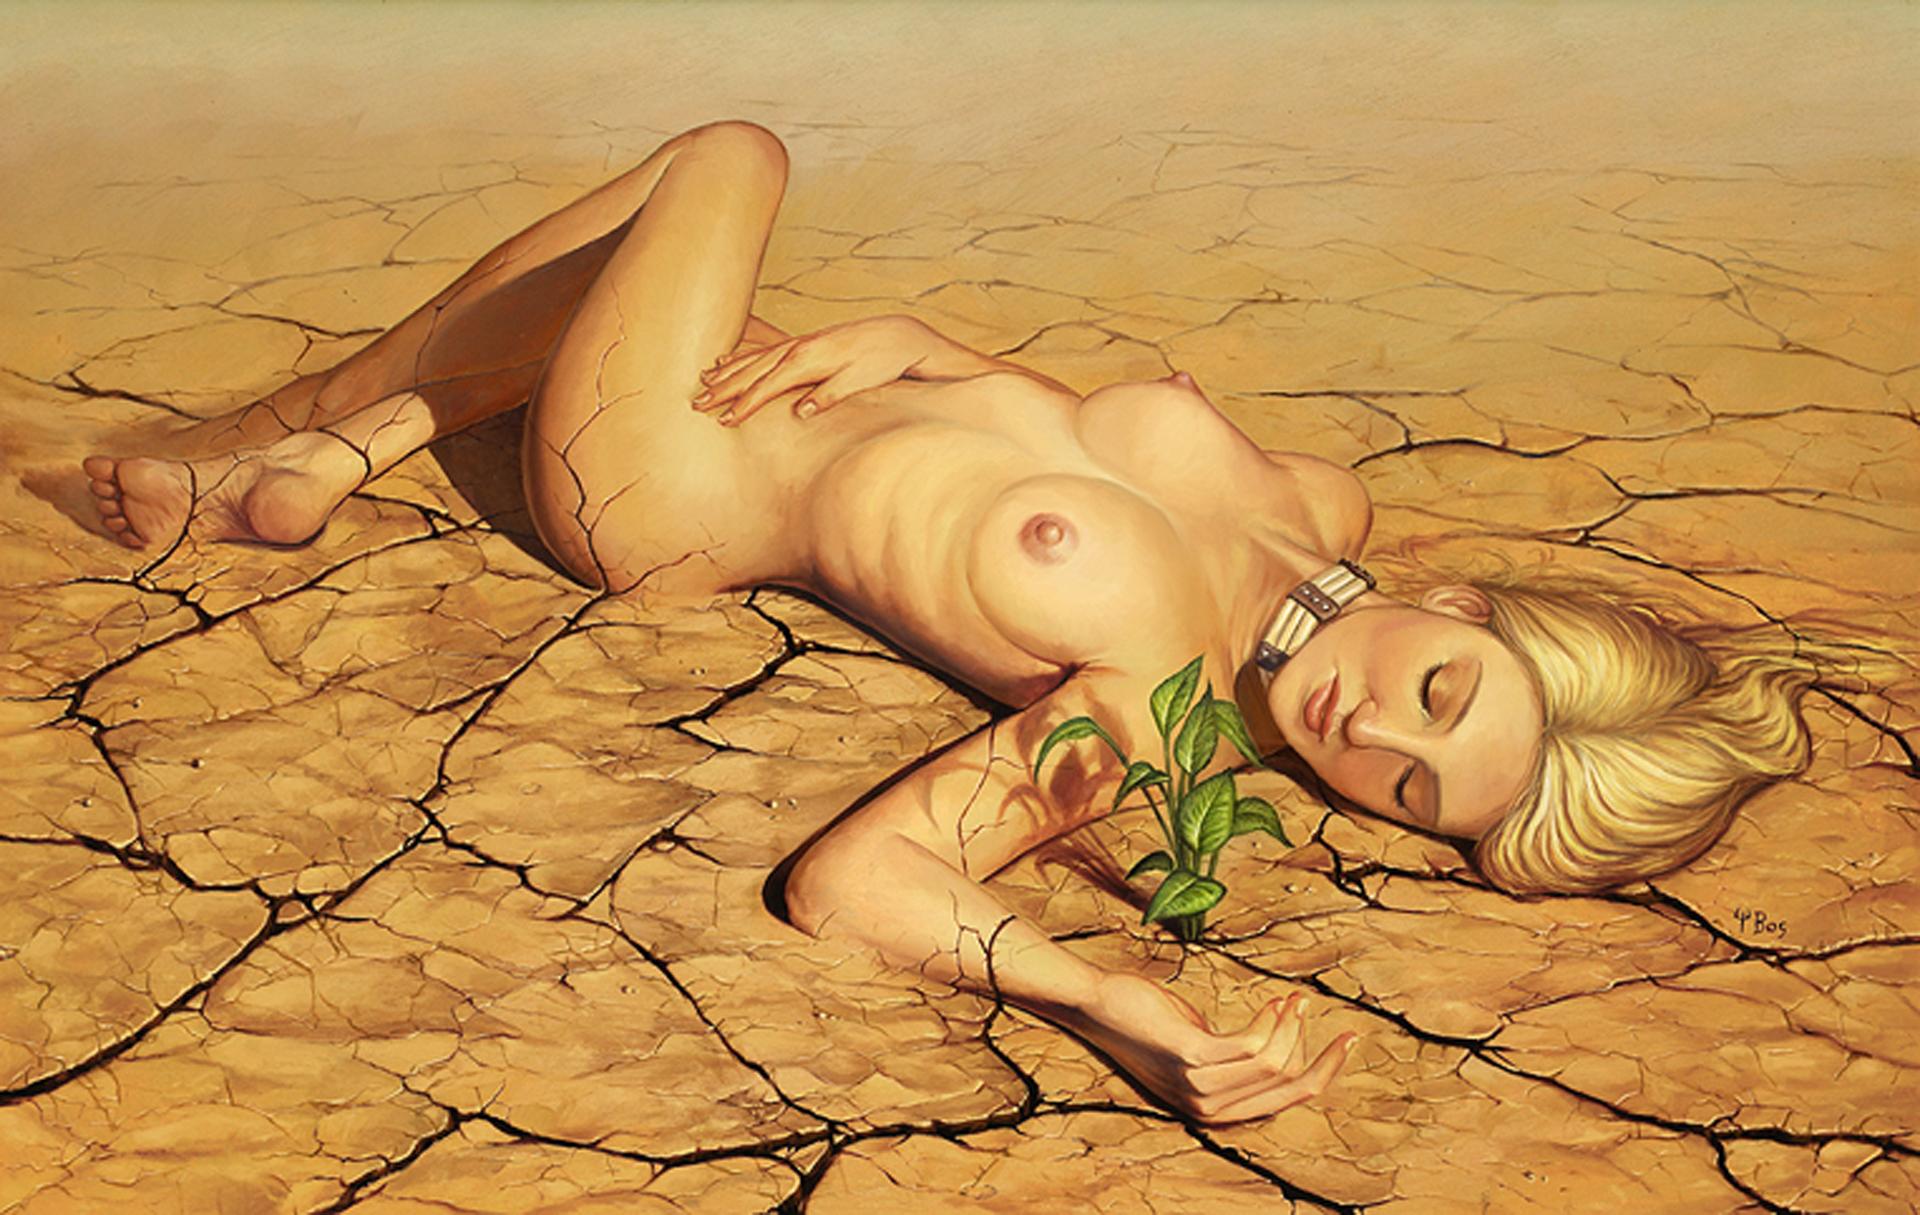 Секс в пустыне онлайн 13 фотография